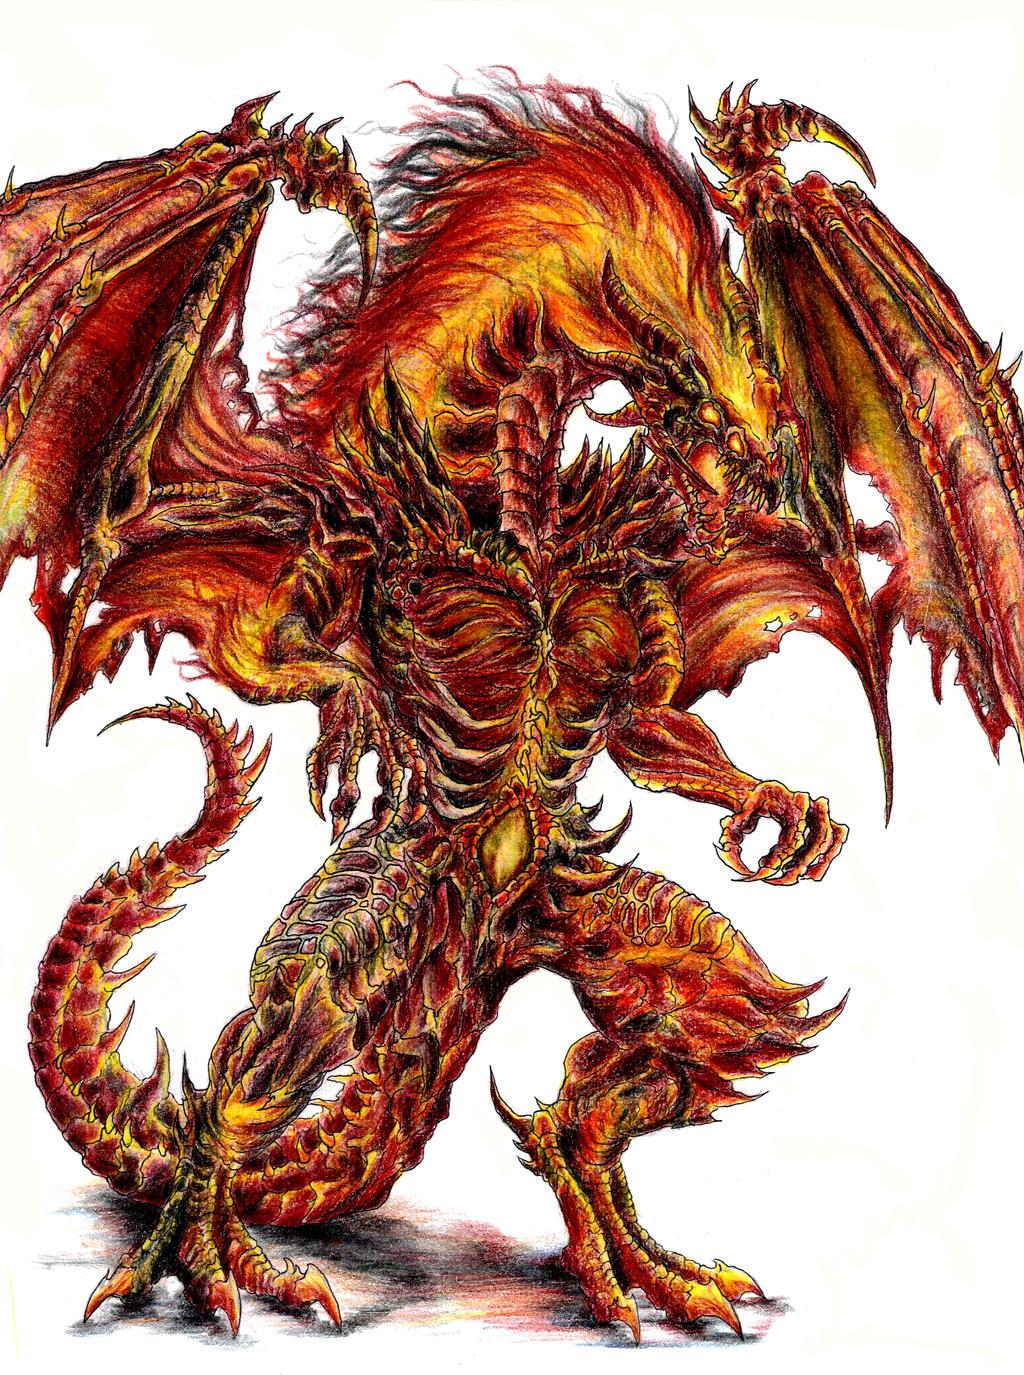 miscellaneous fire dragon picture - photo #41